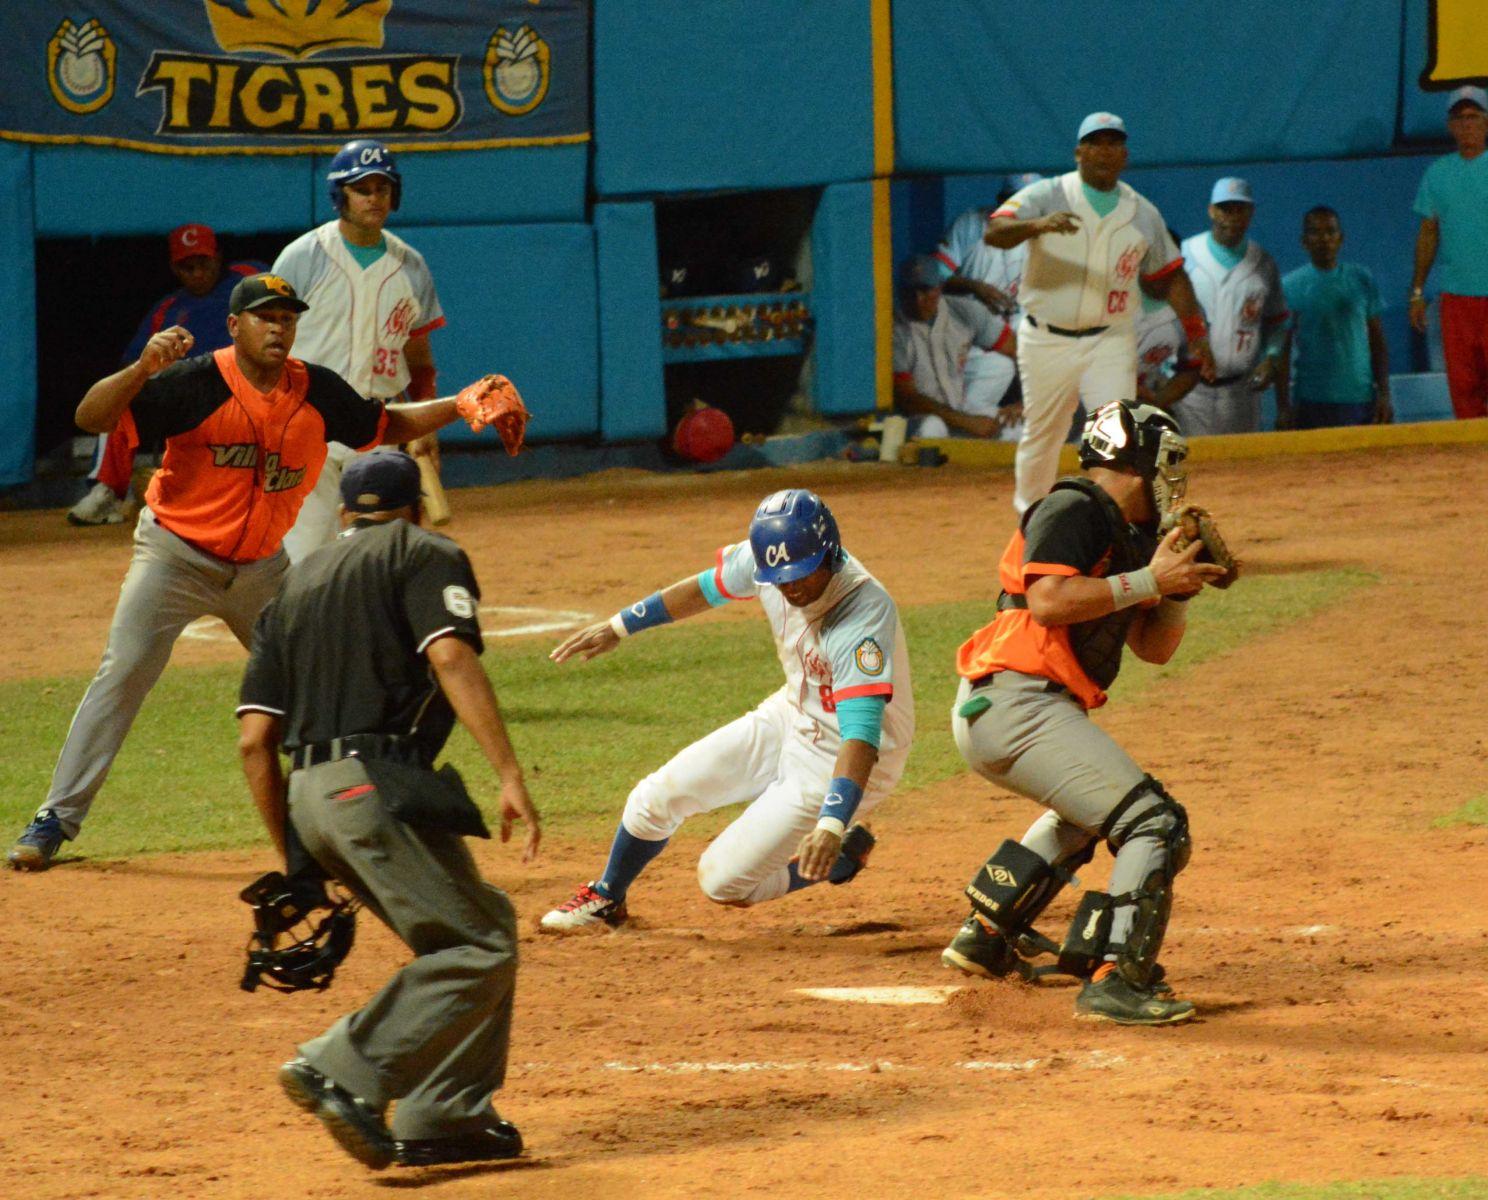 Play Off entre Ciego de Ávila y Villa Clara. 56 Serie Nacional de Béisbol de Cuba. Foto: Osvaldo Gutierrez